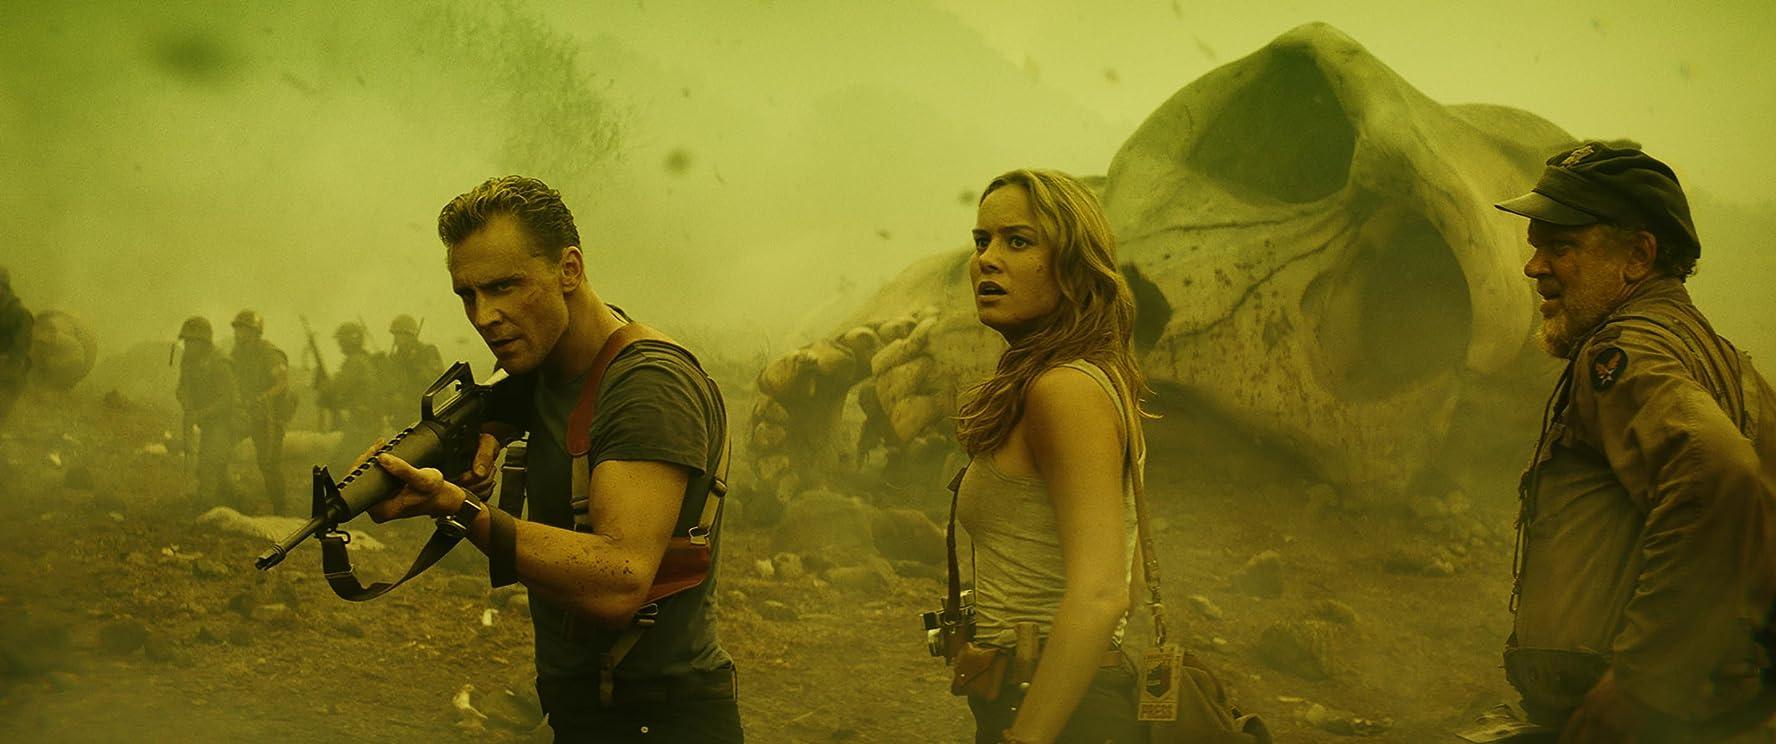 John C. Reilly, Brie Larson, and Tom Hiddleston in Kong: Skull Island (2017)